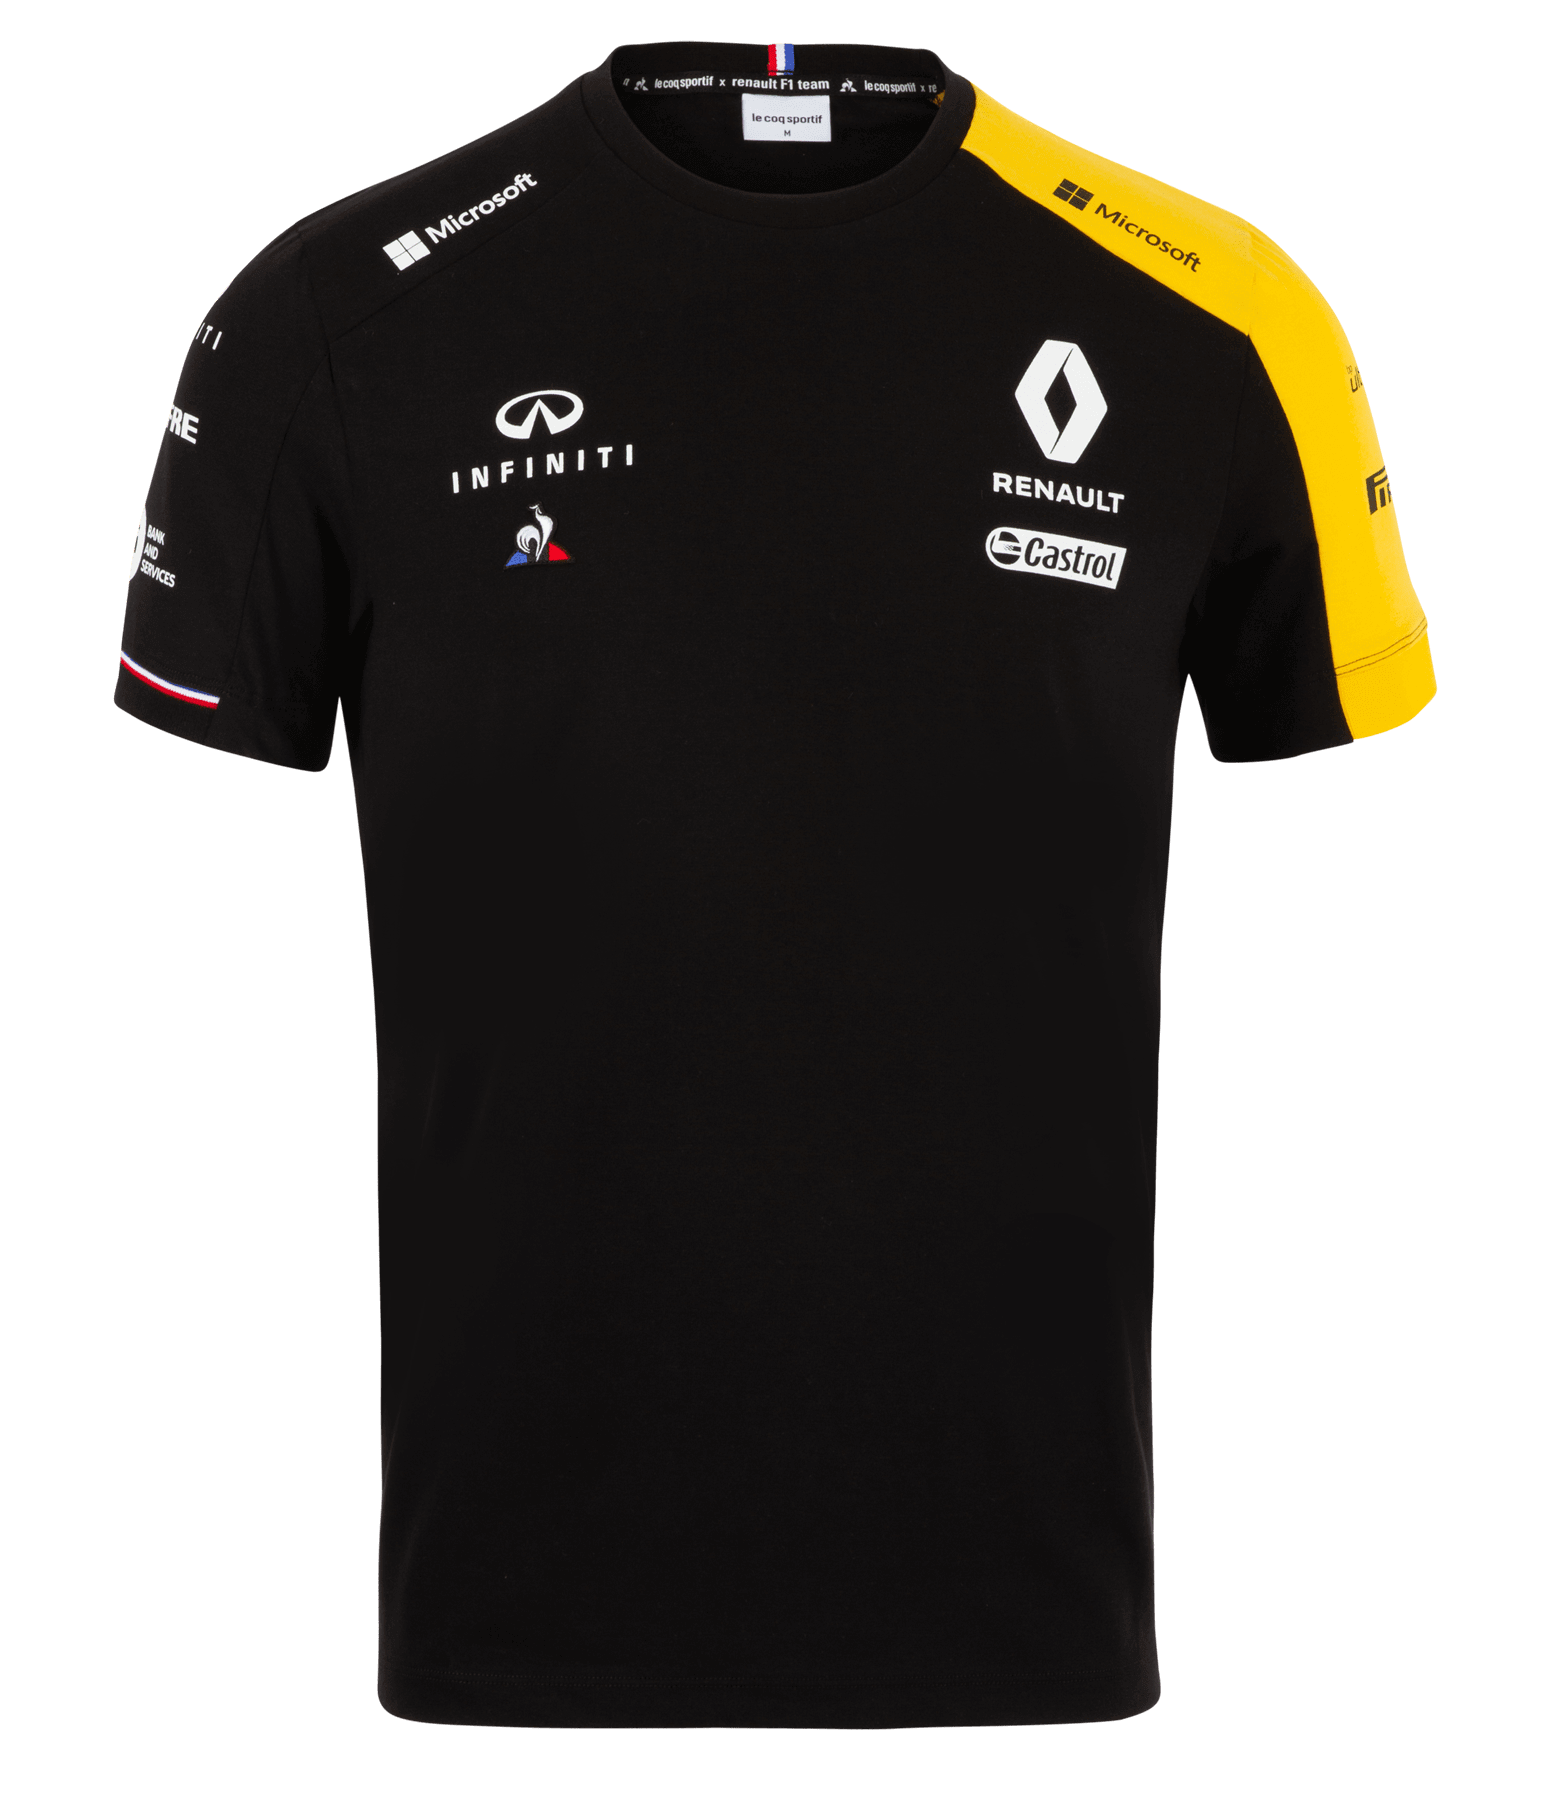 RENAULT F1® TEAM 2019 men's t-shirt - black